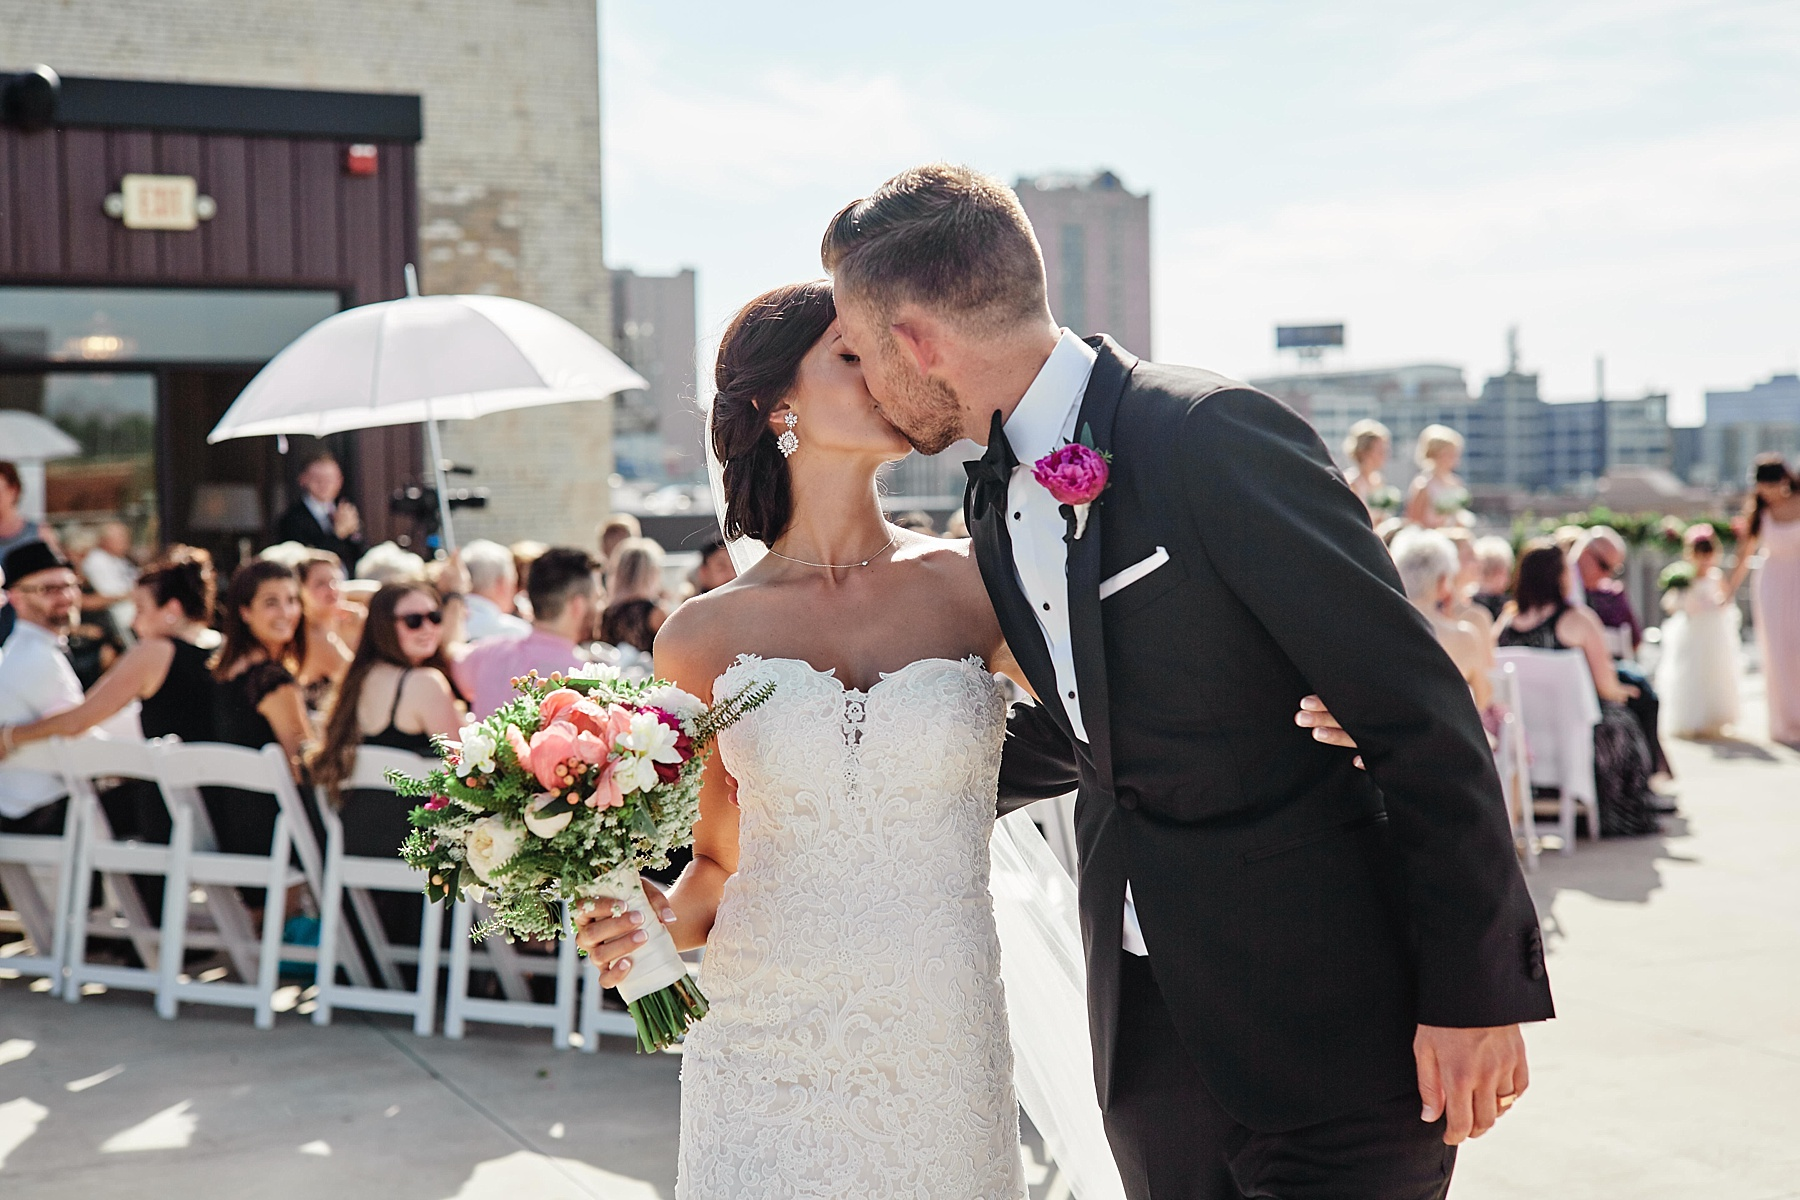 ABULAE-Wedding-Saint-paul-MN-Josh-Sofia-Wedding-Mears-Park_0778.jpg